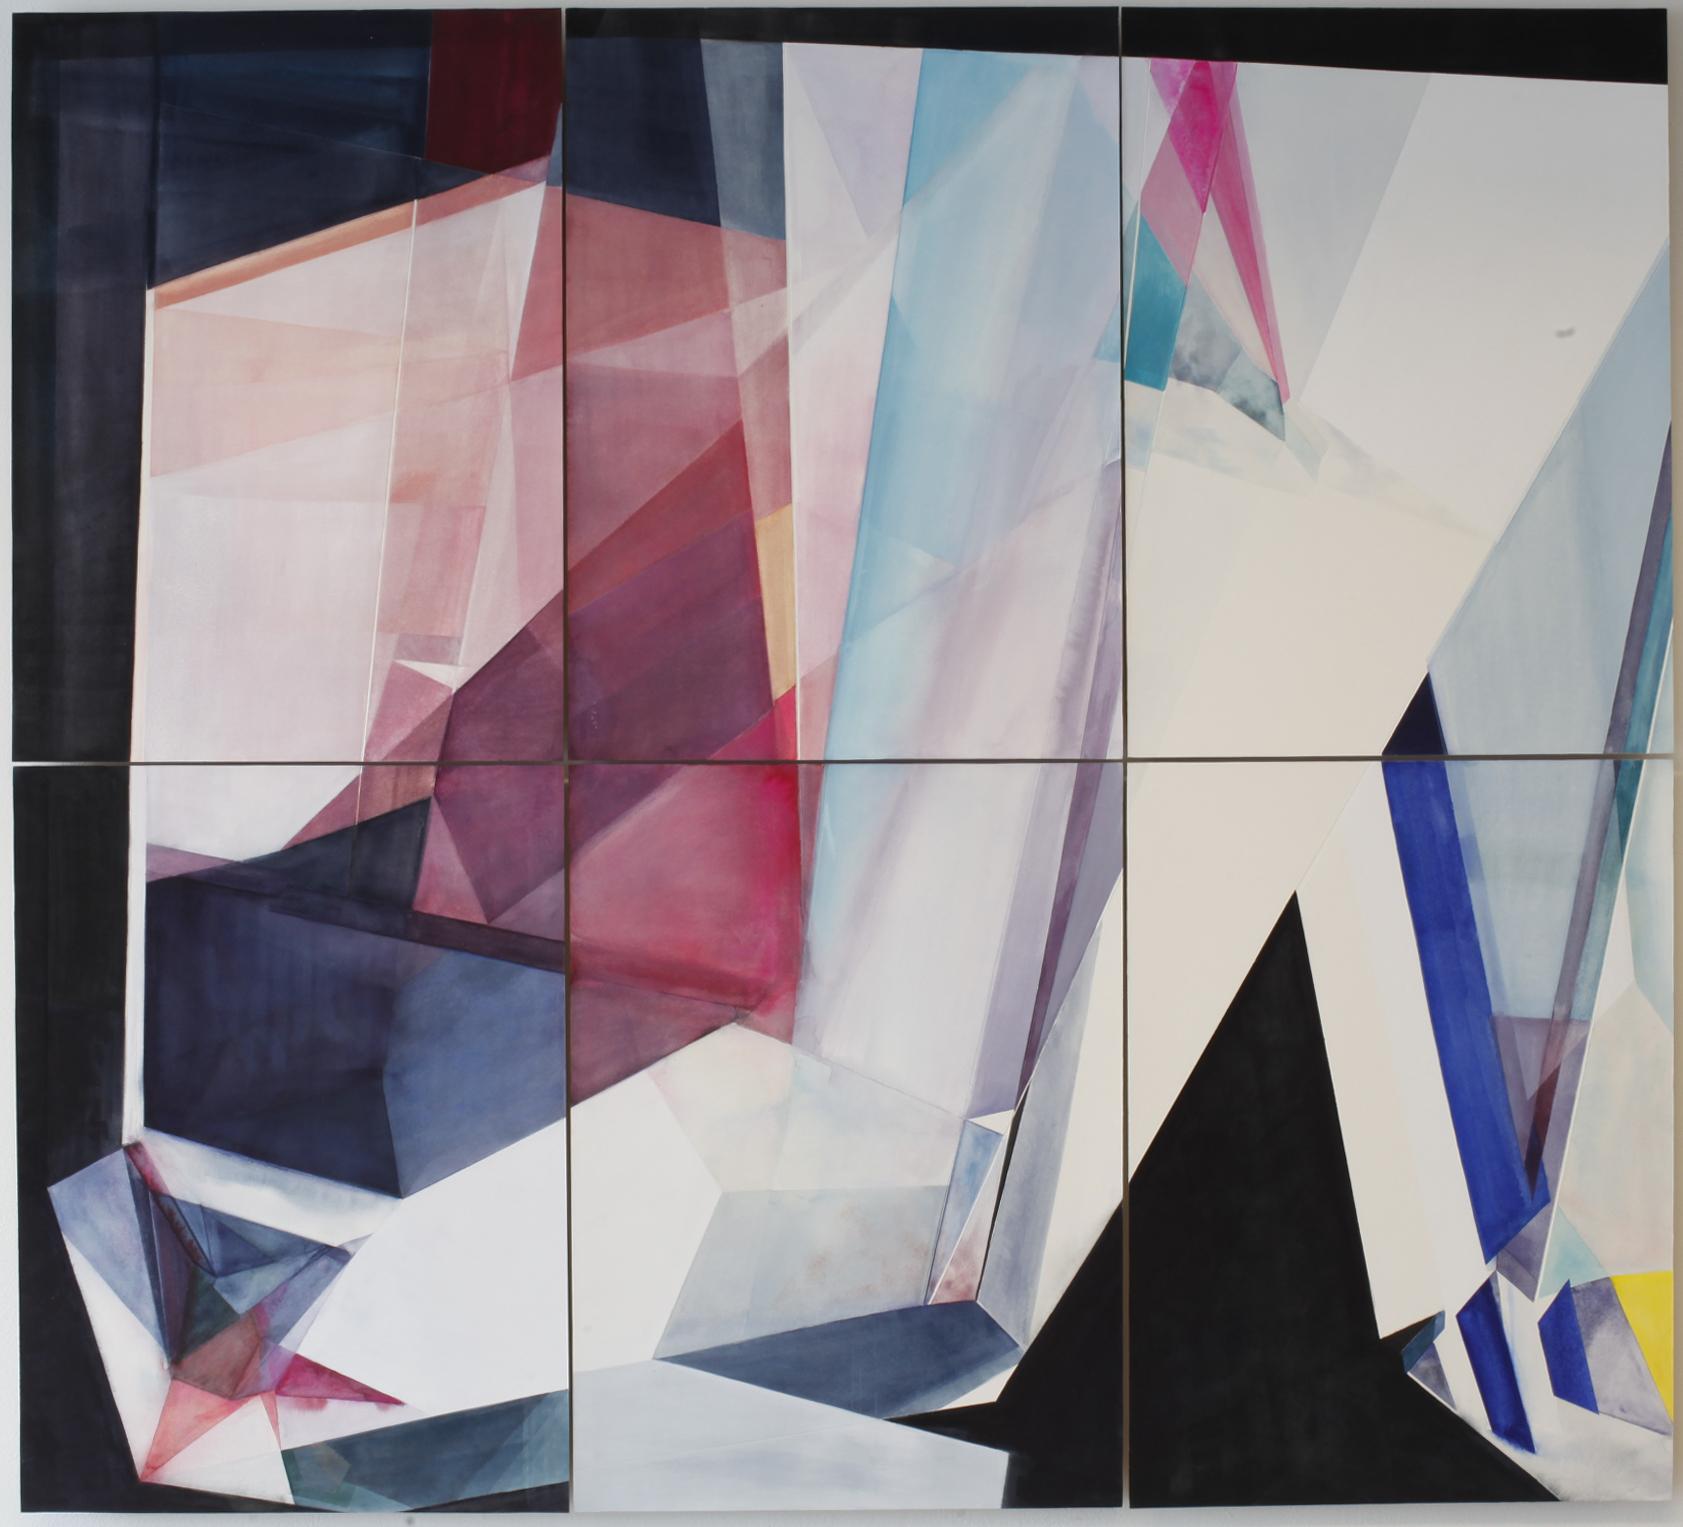 Untitled (6panels), 2012